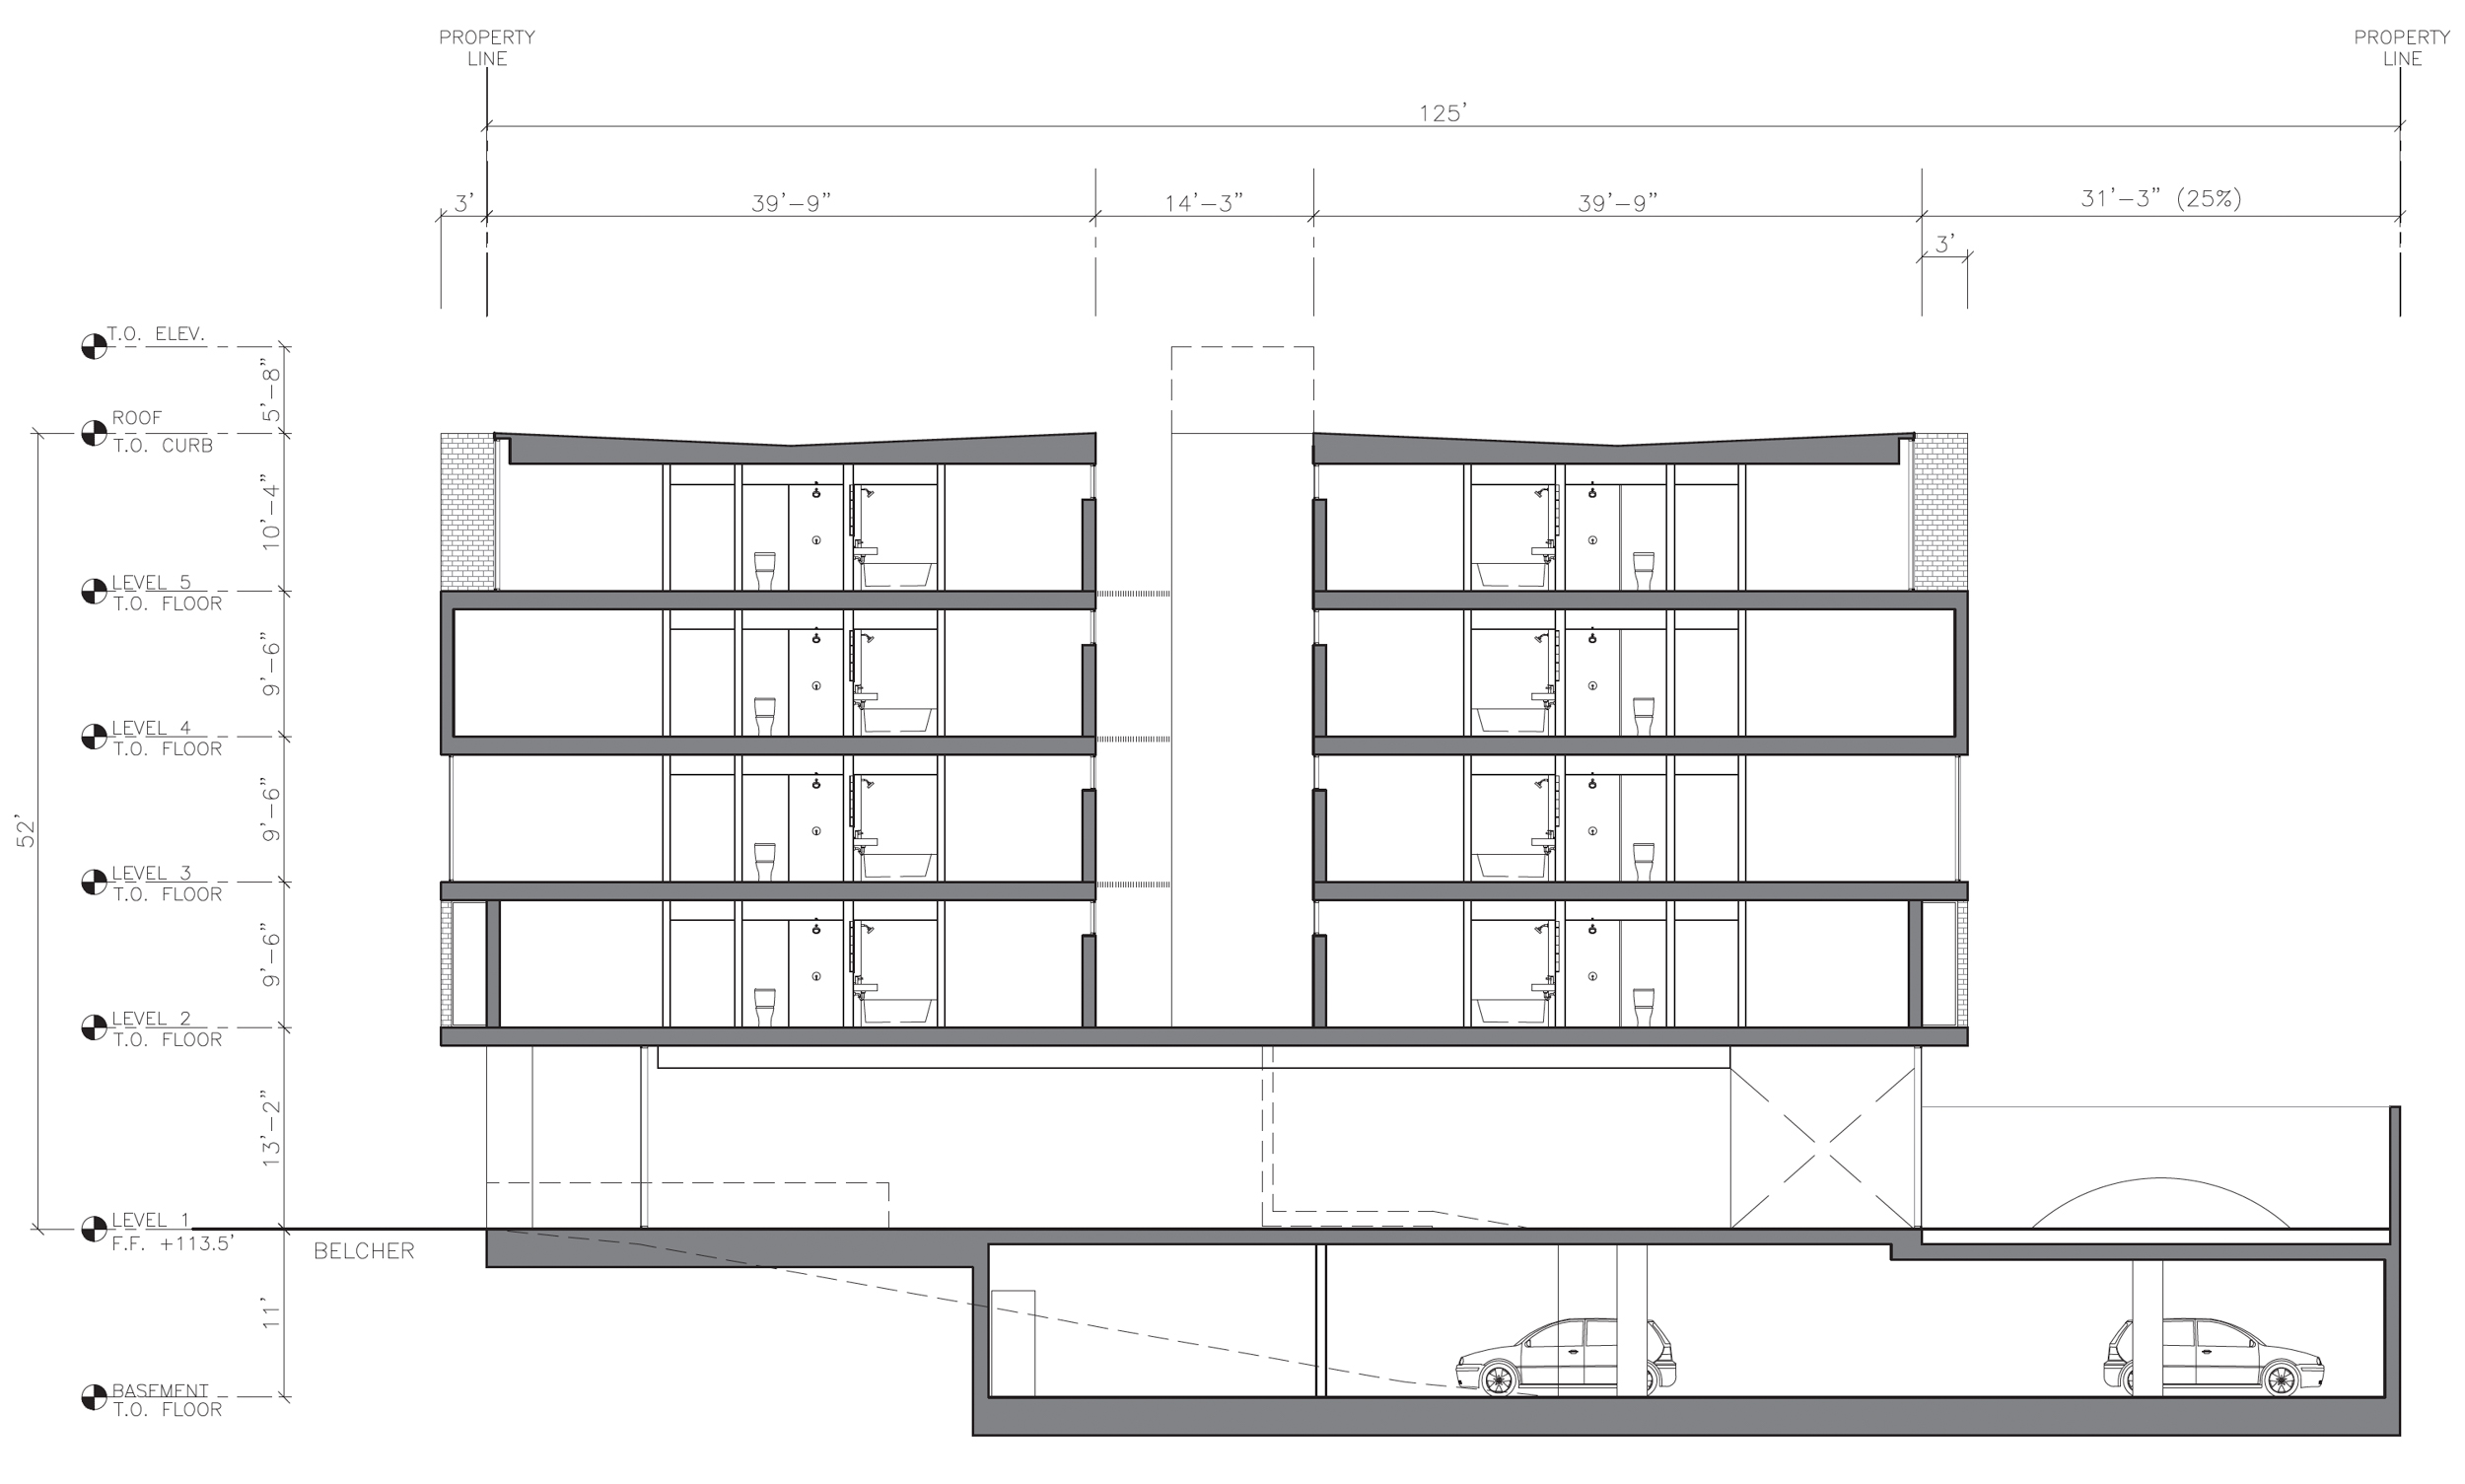 67-69 Belcher Street side-view elevation, illustration by Stanley Saitowitz | Natoma Architects